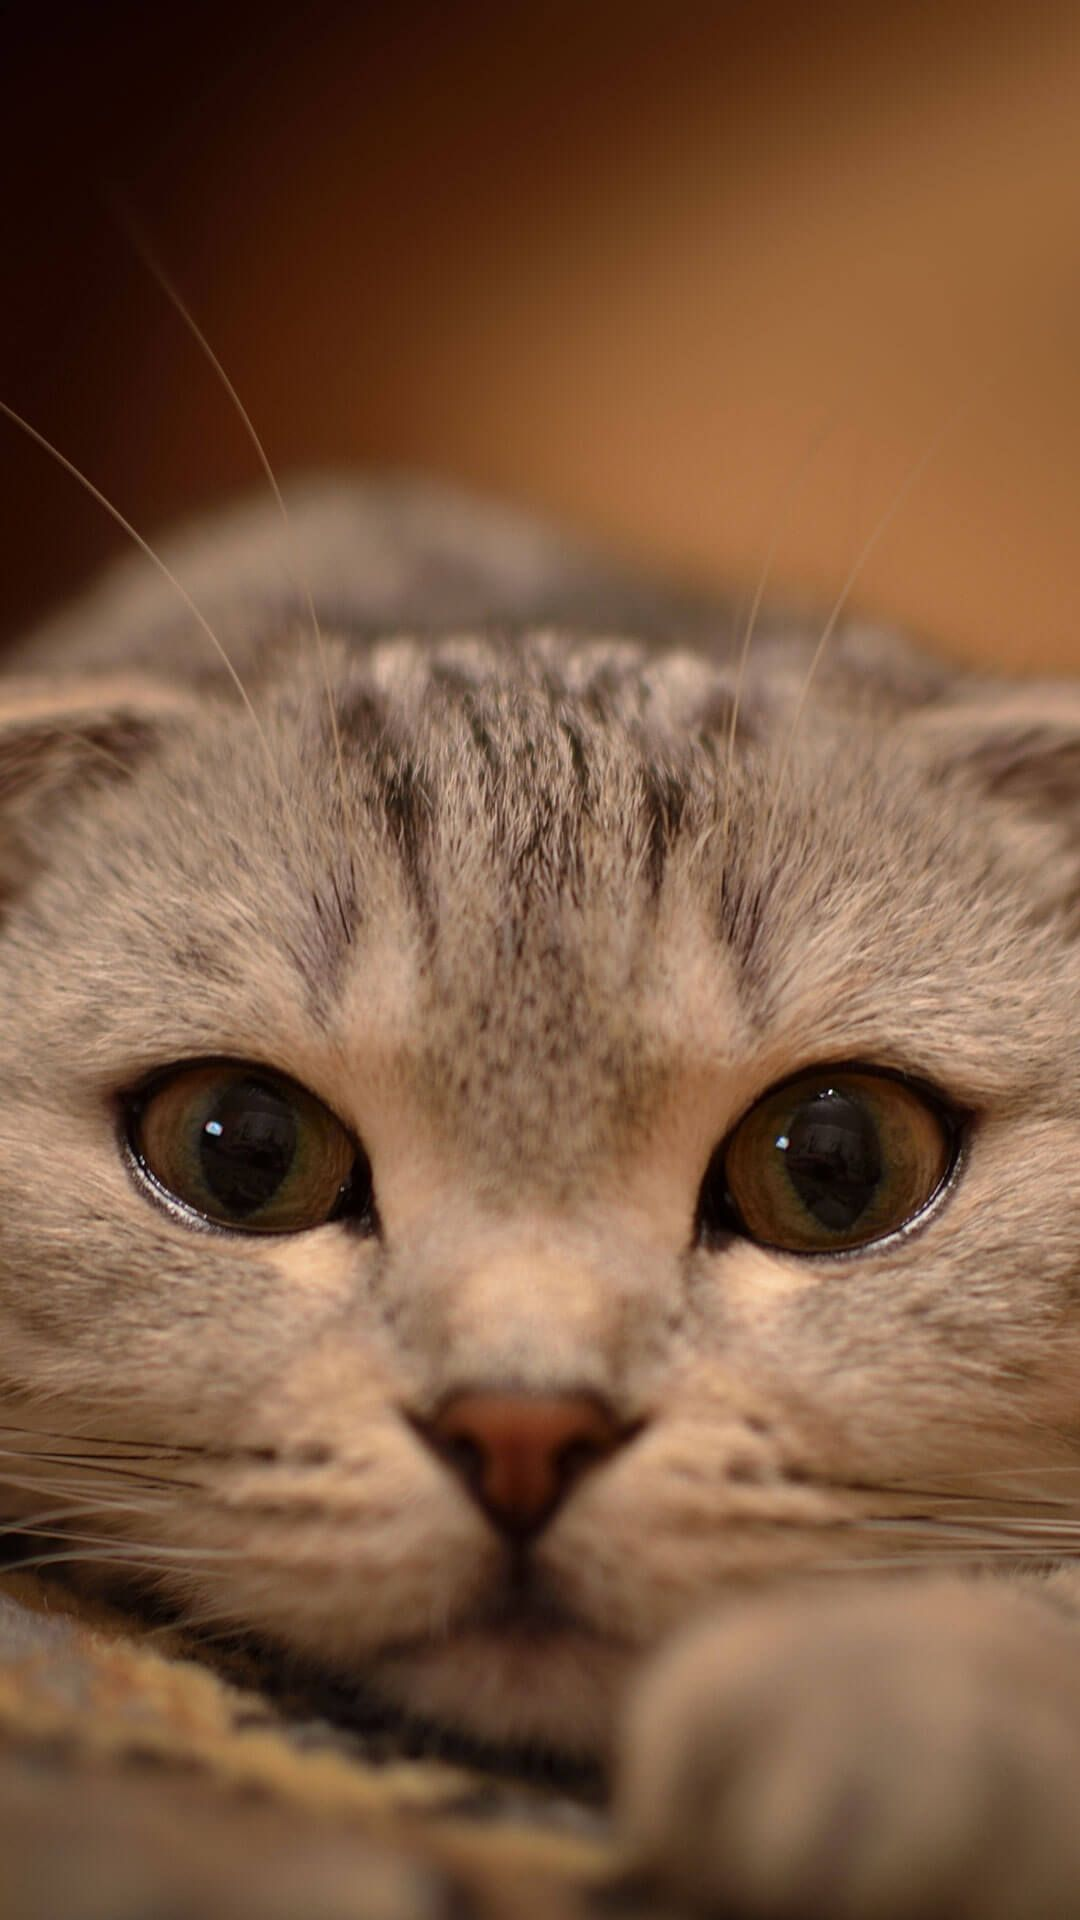 Cute Cat Wallpaper For iPhone 6 Plus HD Cute cat